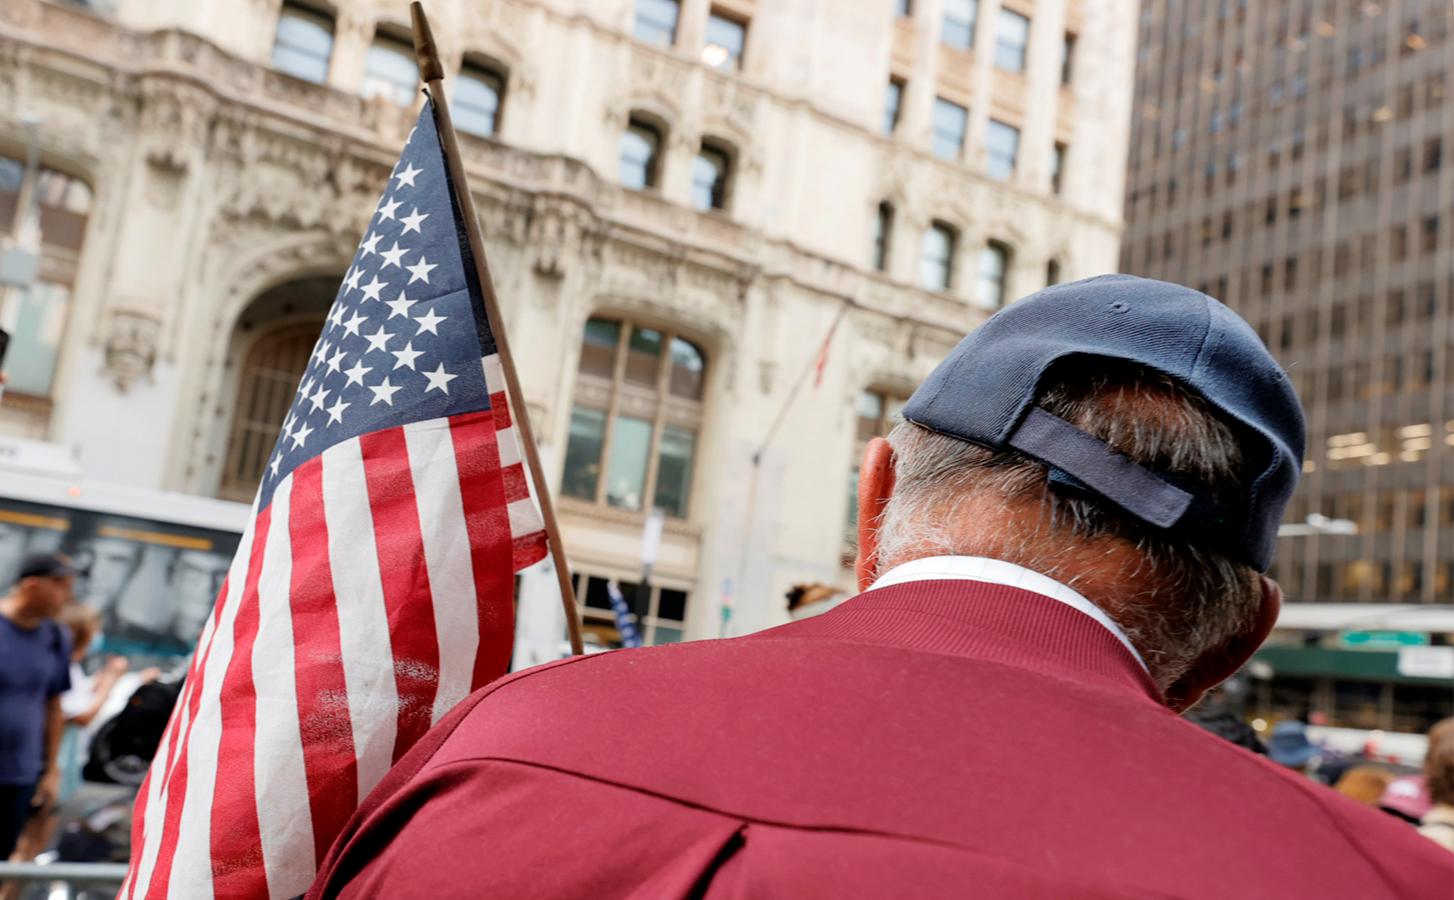 Фото: Michael Loccisano / Getty Images